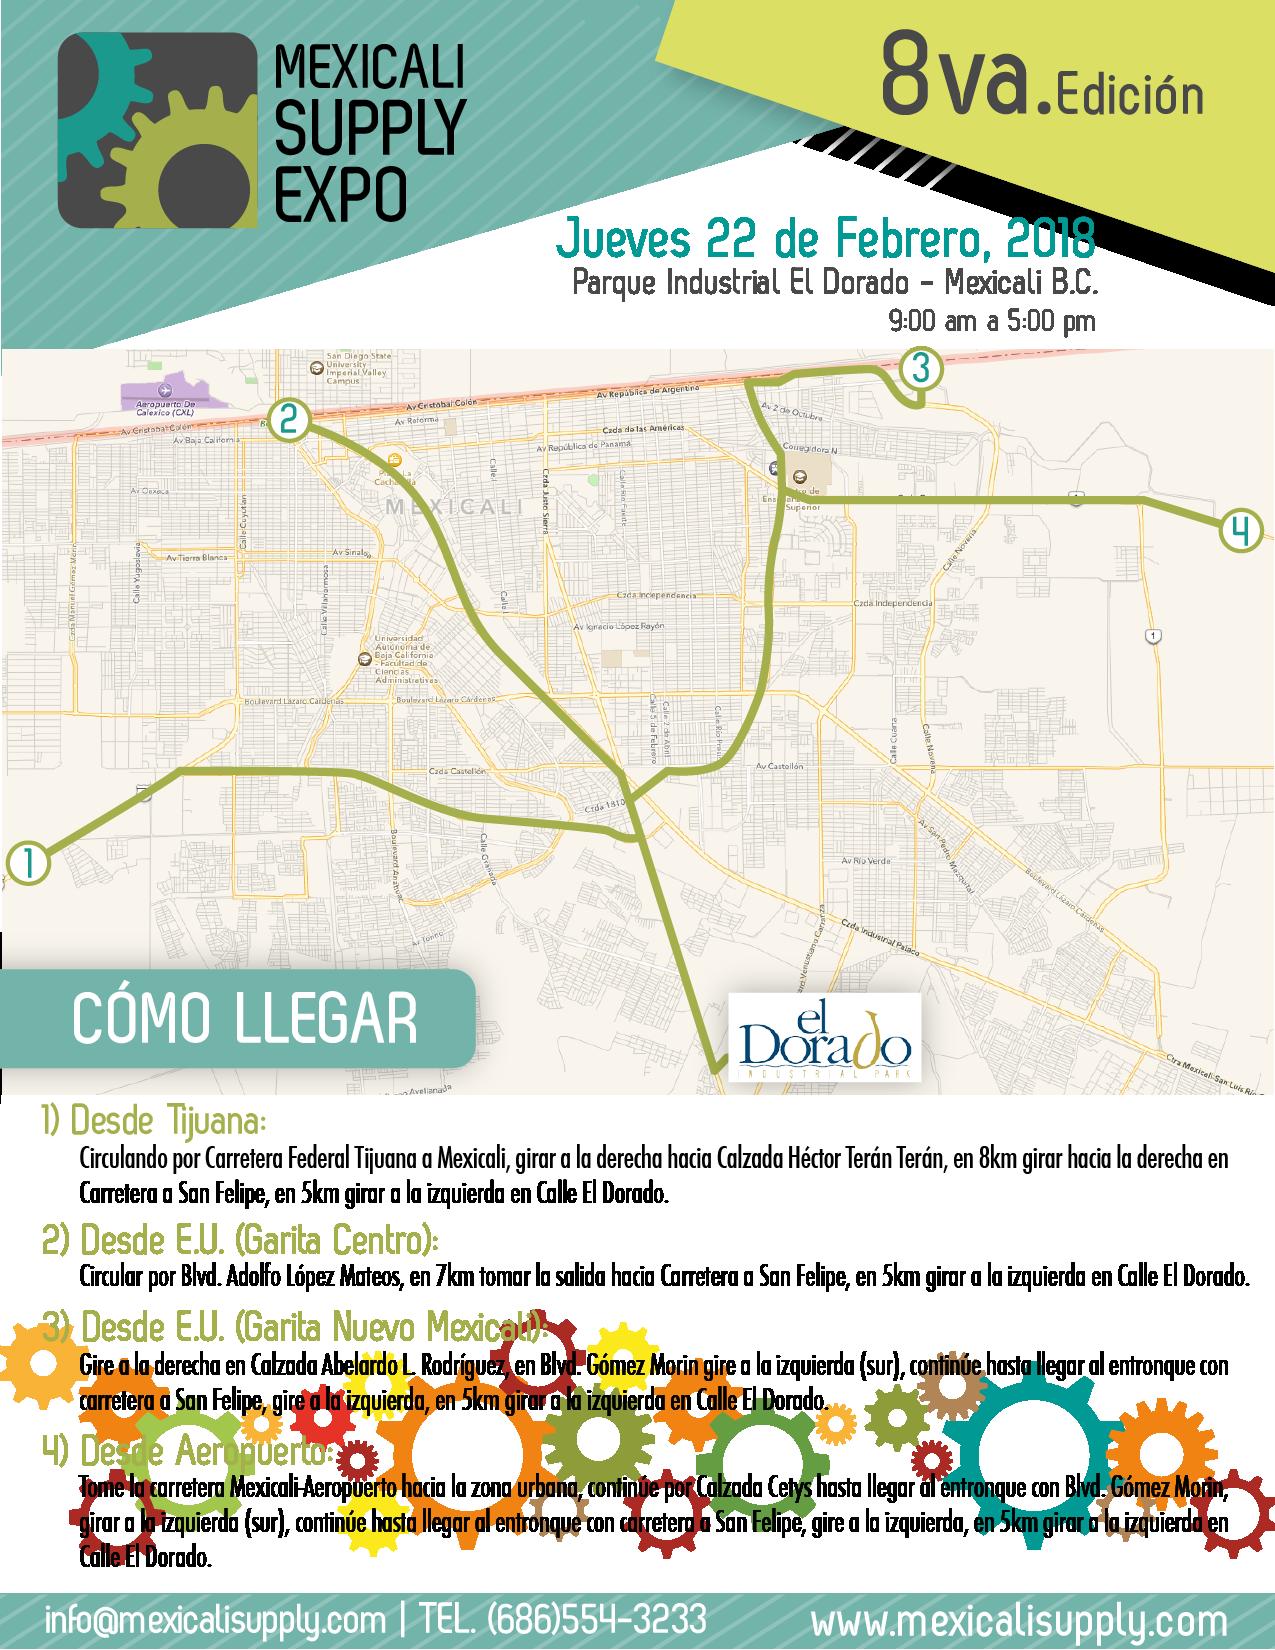 mapa-mexicali-supply